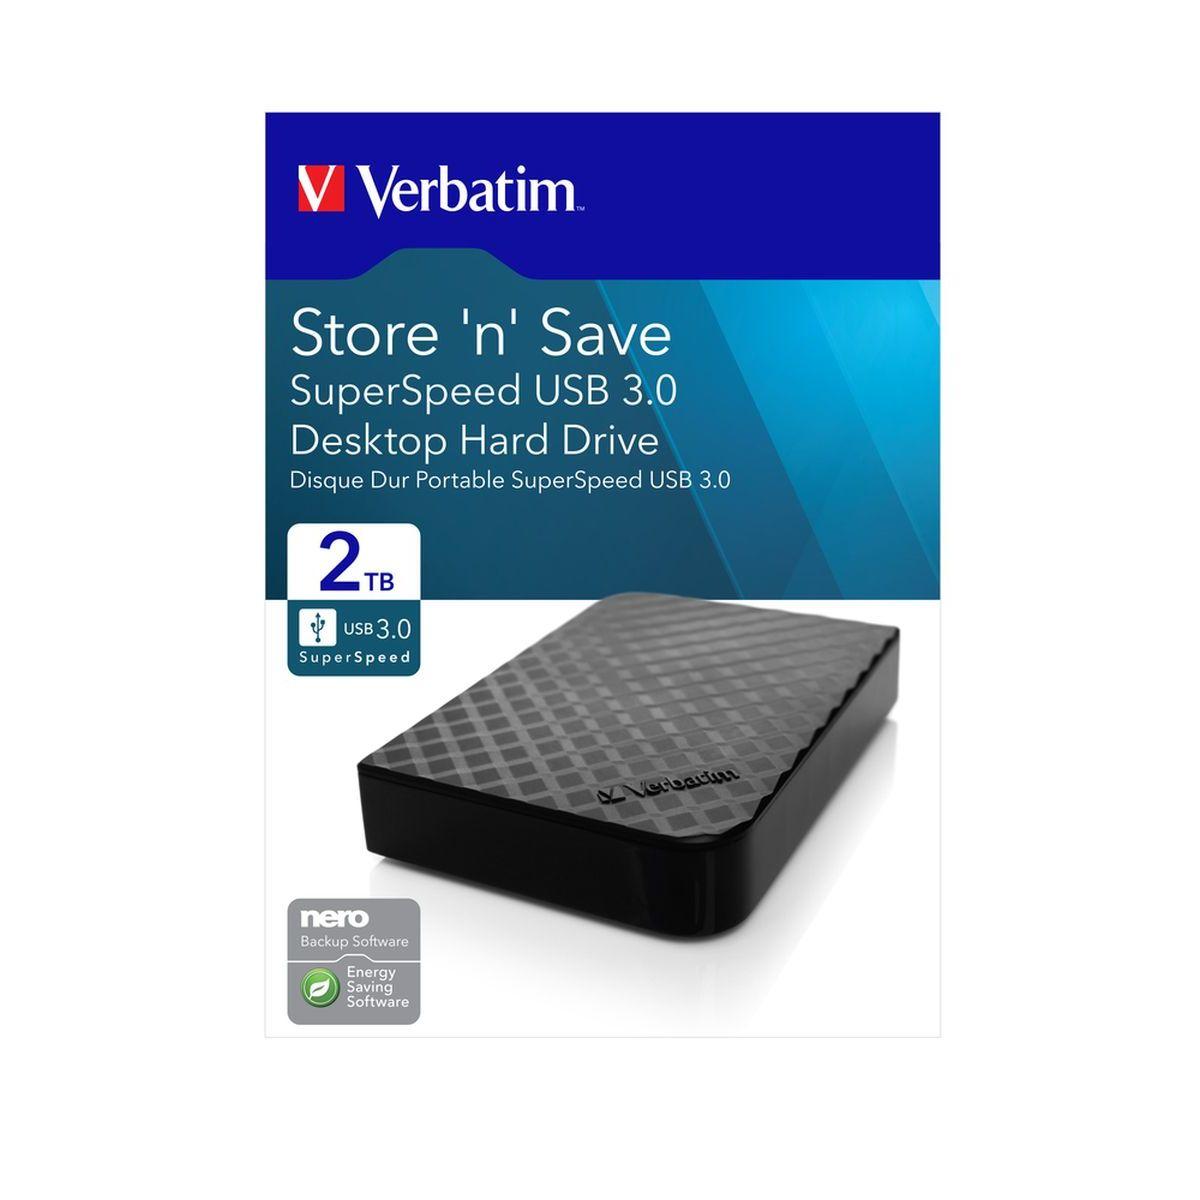 Preisfehler - Verbatim Externe 8,89 cm Festplatte - USB-3.0-Laufwerk, 2000 GB - 11,99 PLUS Versand